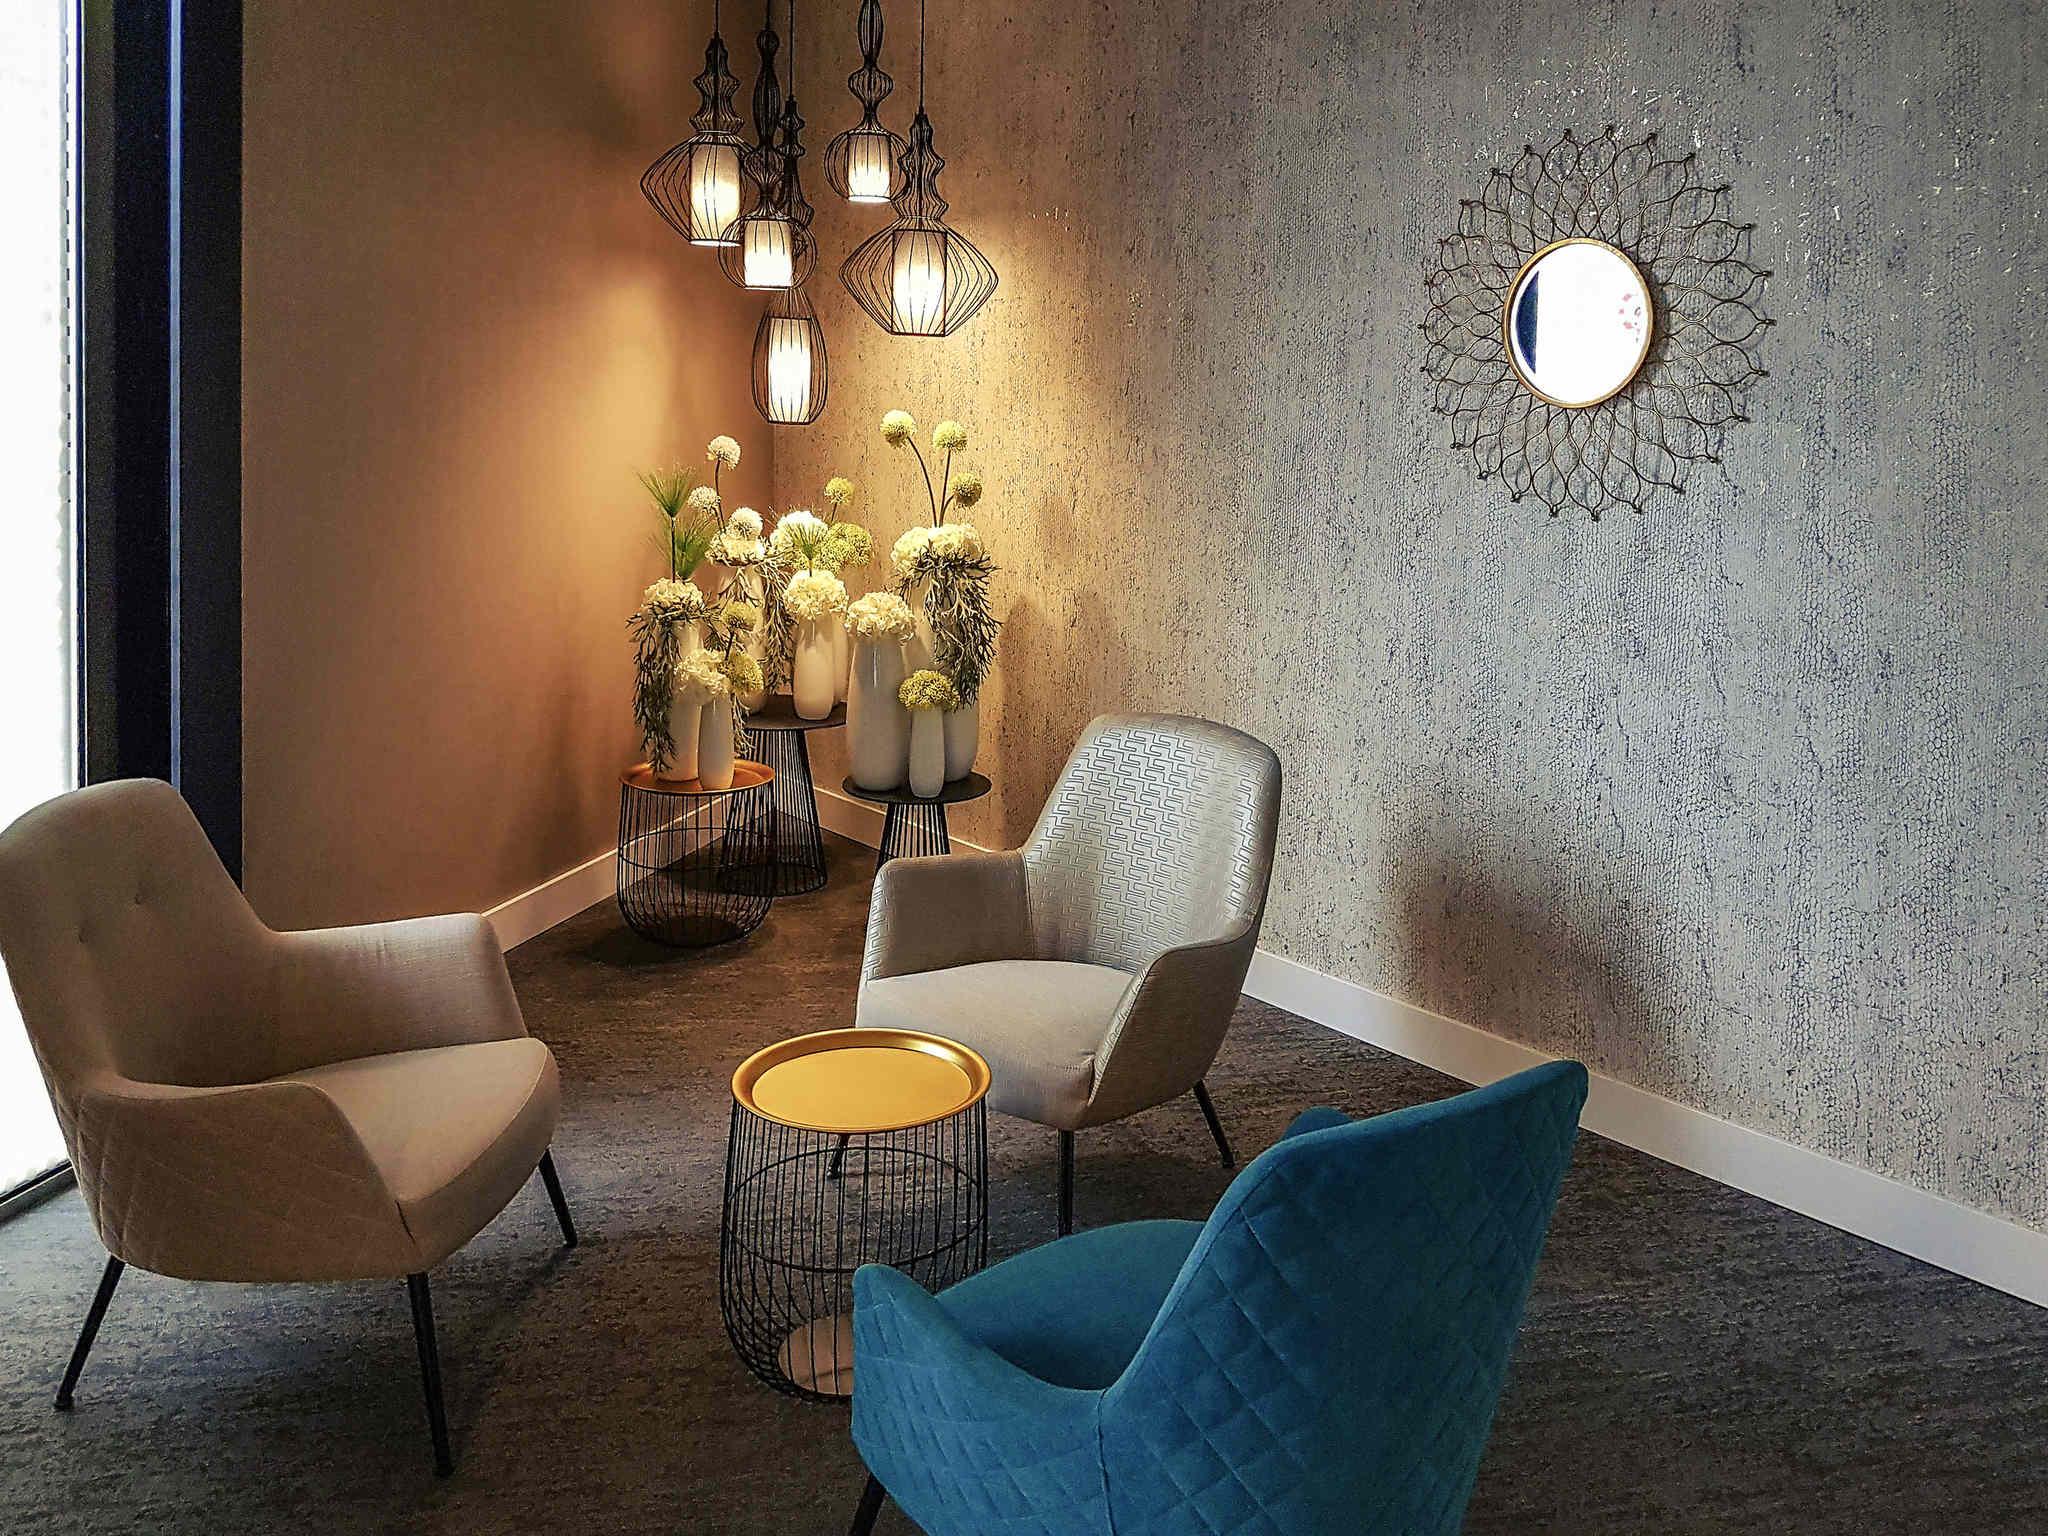 Hotel – Hotel Mercure Libourne Saint Emilion